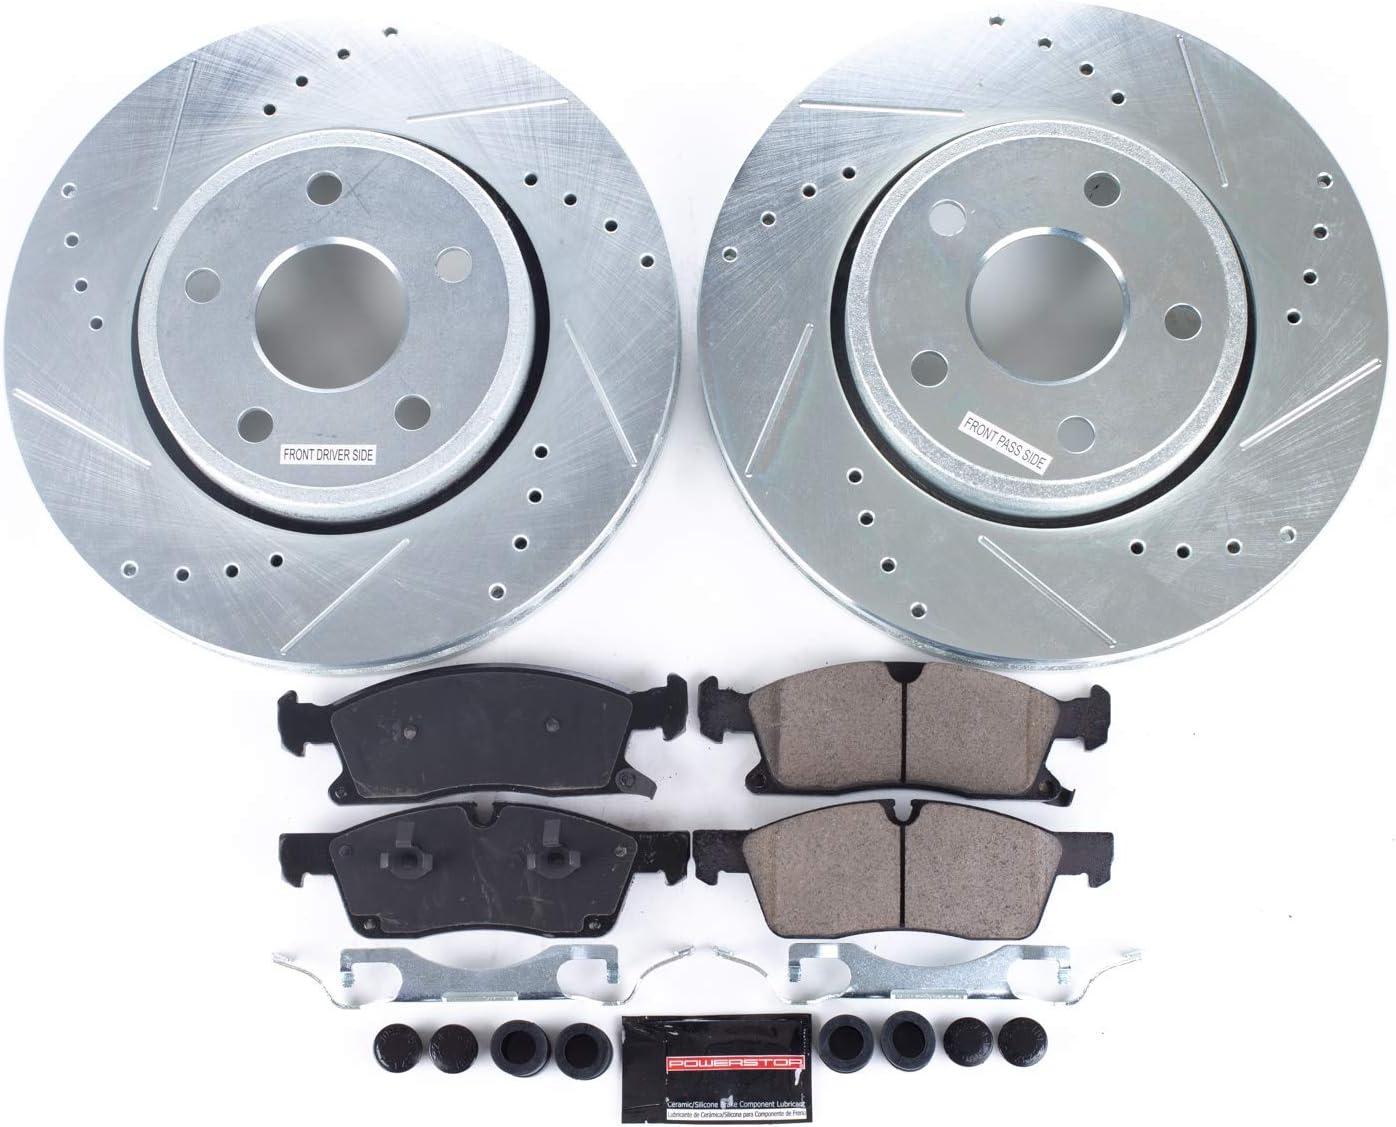 Max Brakes Front /& Rear Supreme Brake Kit KM152723 Fits: 2015 15 Jeep Grand Cherokee w//350mm Front Rotors /& Rear Vented Rotors Premium Cross Drilled Rotors + Ceramic Pads